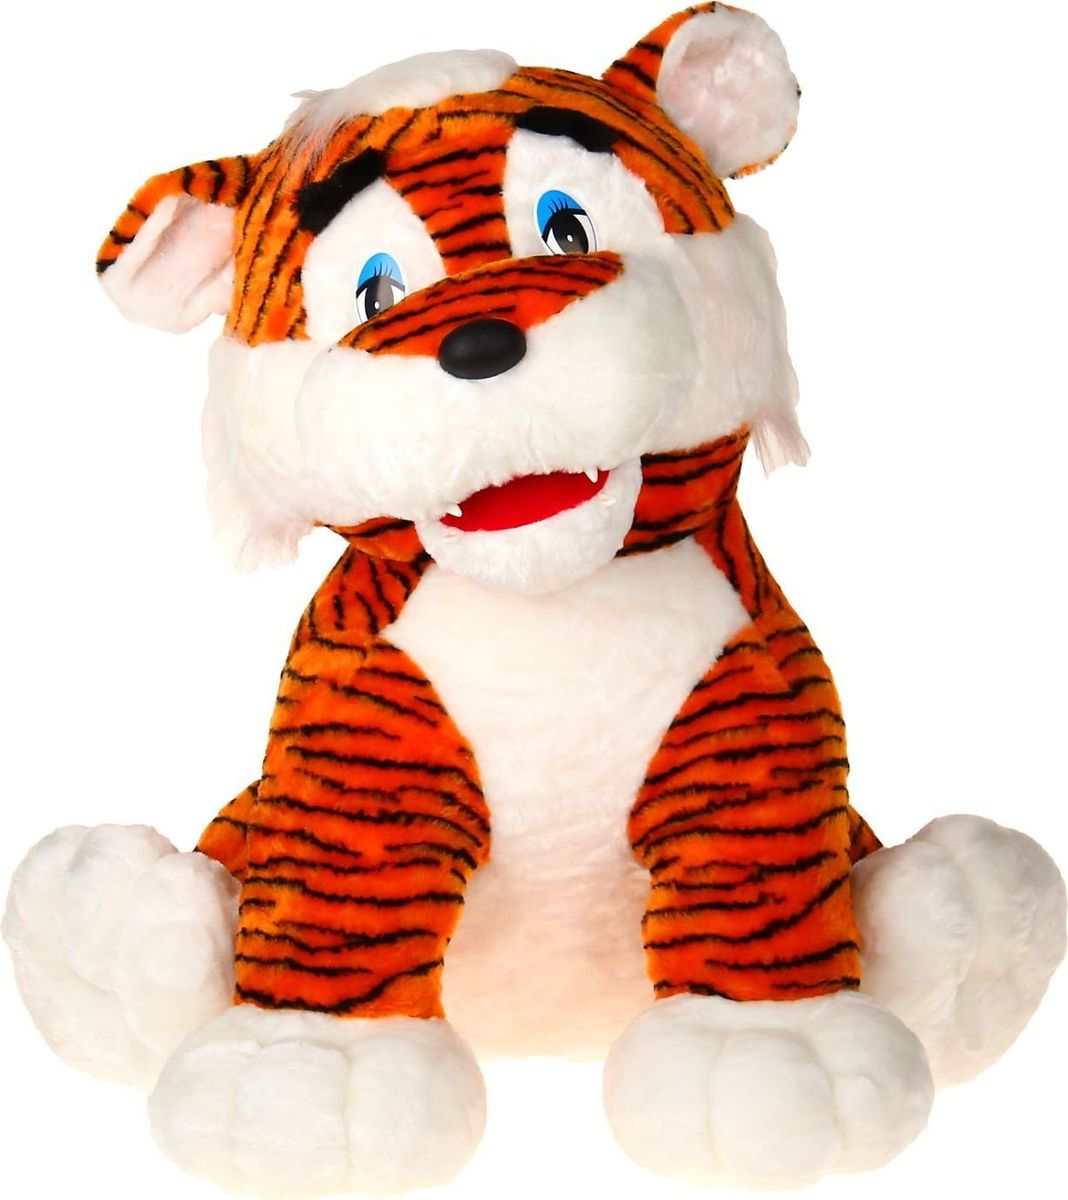 Sima-land Мягкая игрушка Тигр Тоша 80 см sima land мягкая игрушка собака пятнашка 80 см